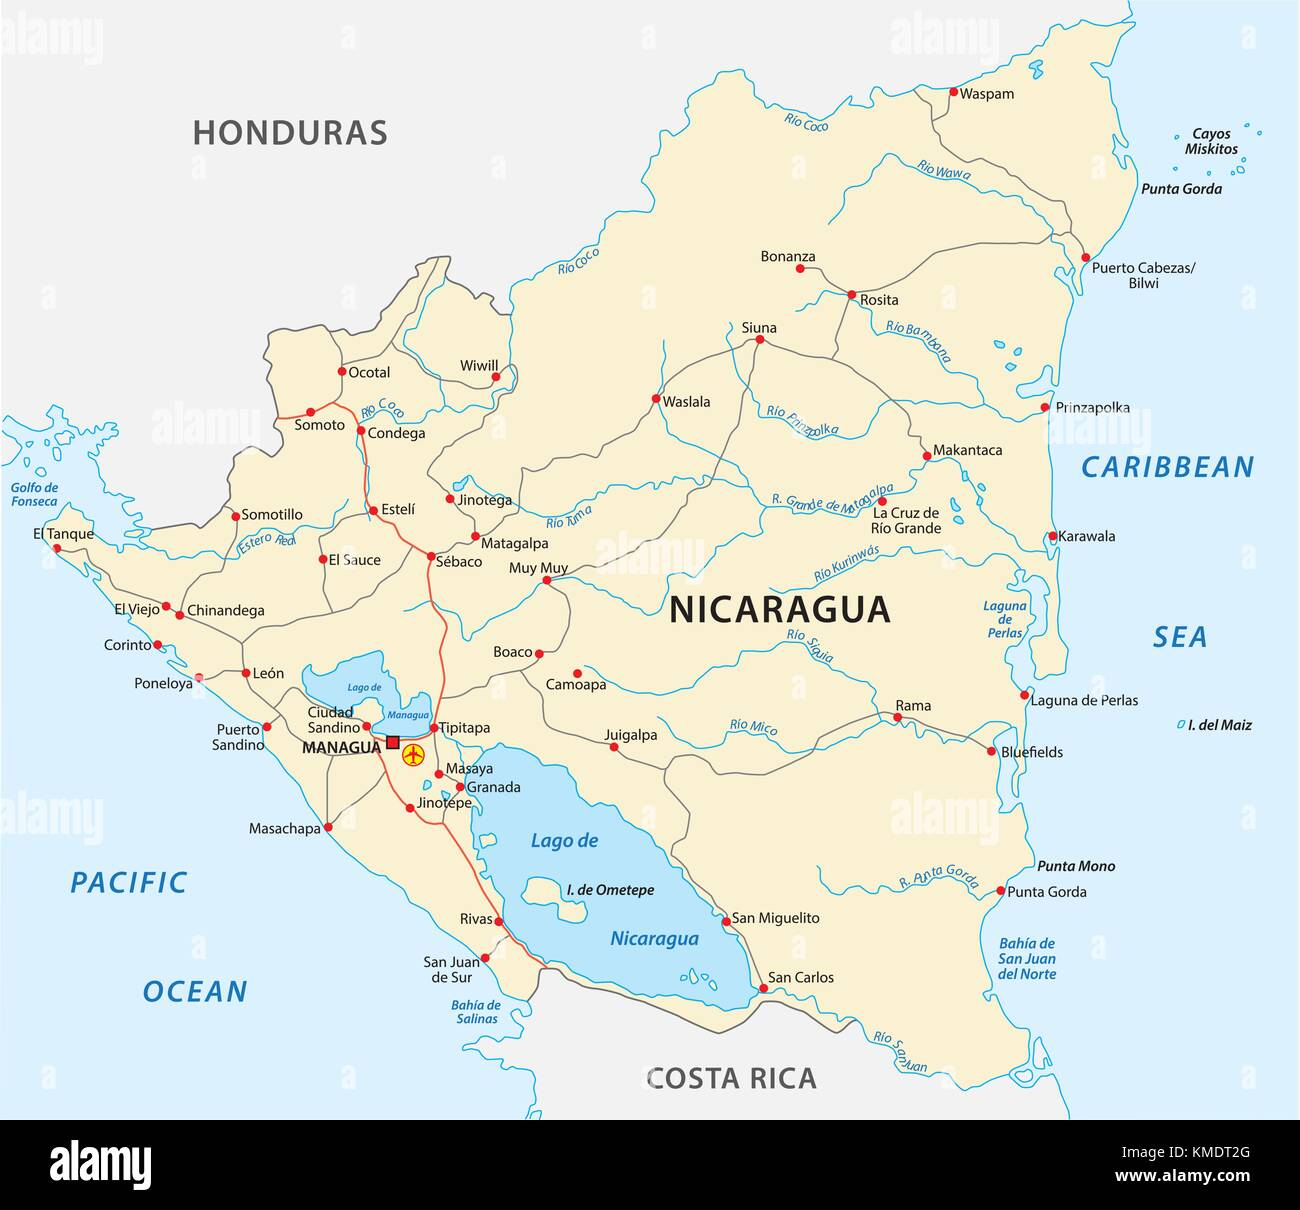 Nicaragua Managua Road Stock Photos & Nicaragua Managua Road ... on tegucigalpa on map, montevideo on map, mbabane on map, makassar on map, taegu on map, cayman islands on map, panama on map, valledupar on map, havana on map, kampala on map, kingston on map, cancun on map, toronto on map, san juan on map, libreville on map, rio de janeiro on map, santiago on map, santo domingo on map, bogota on map, nassau on map,